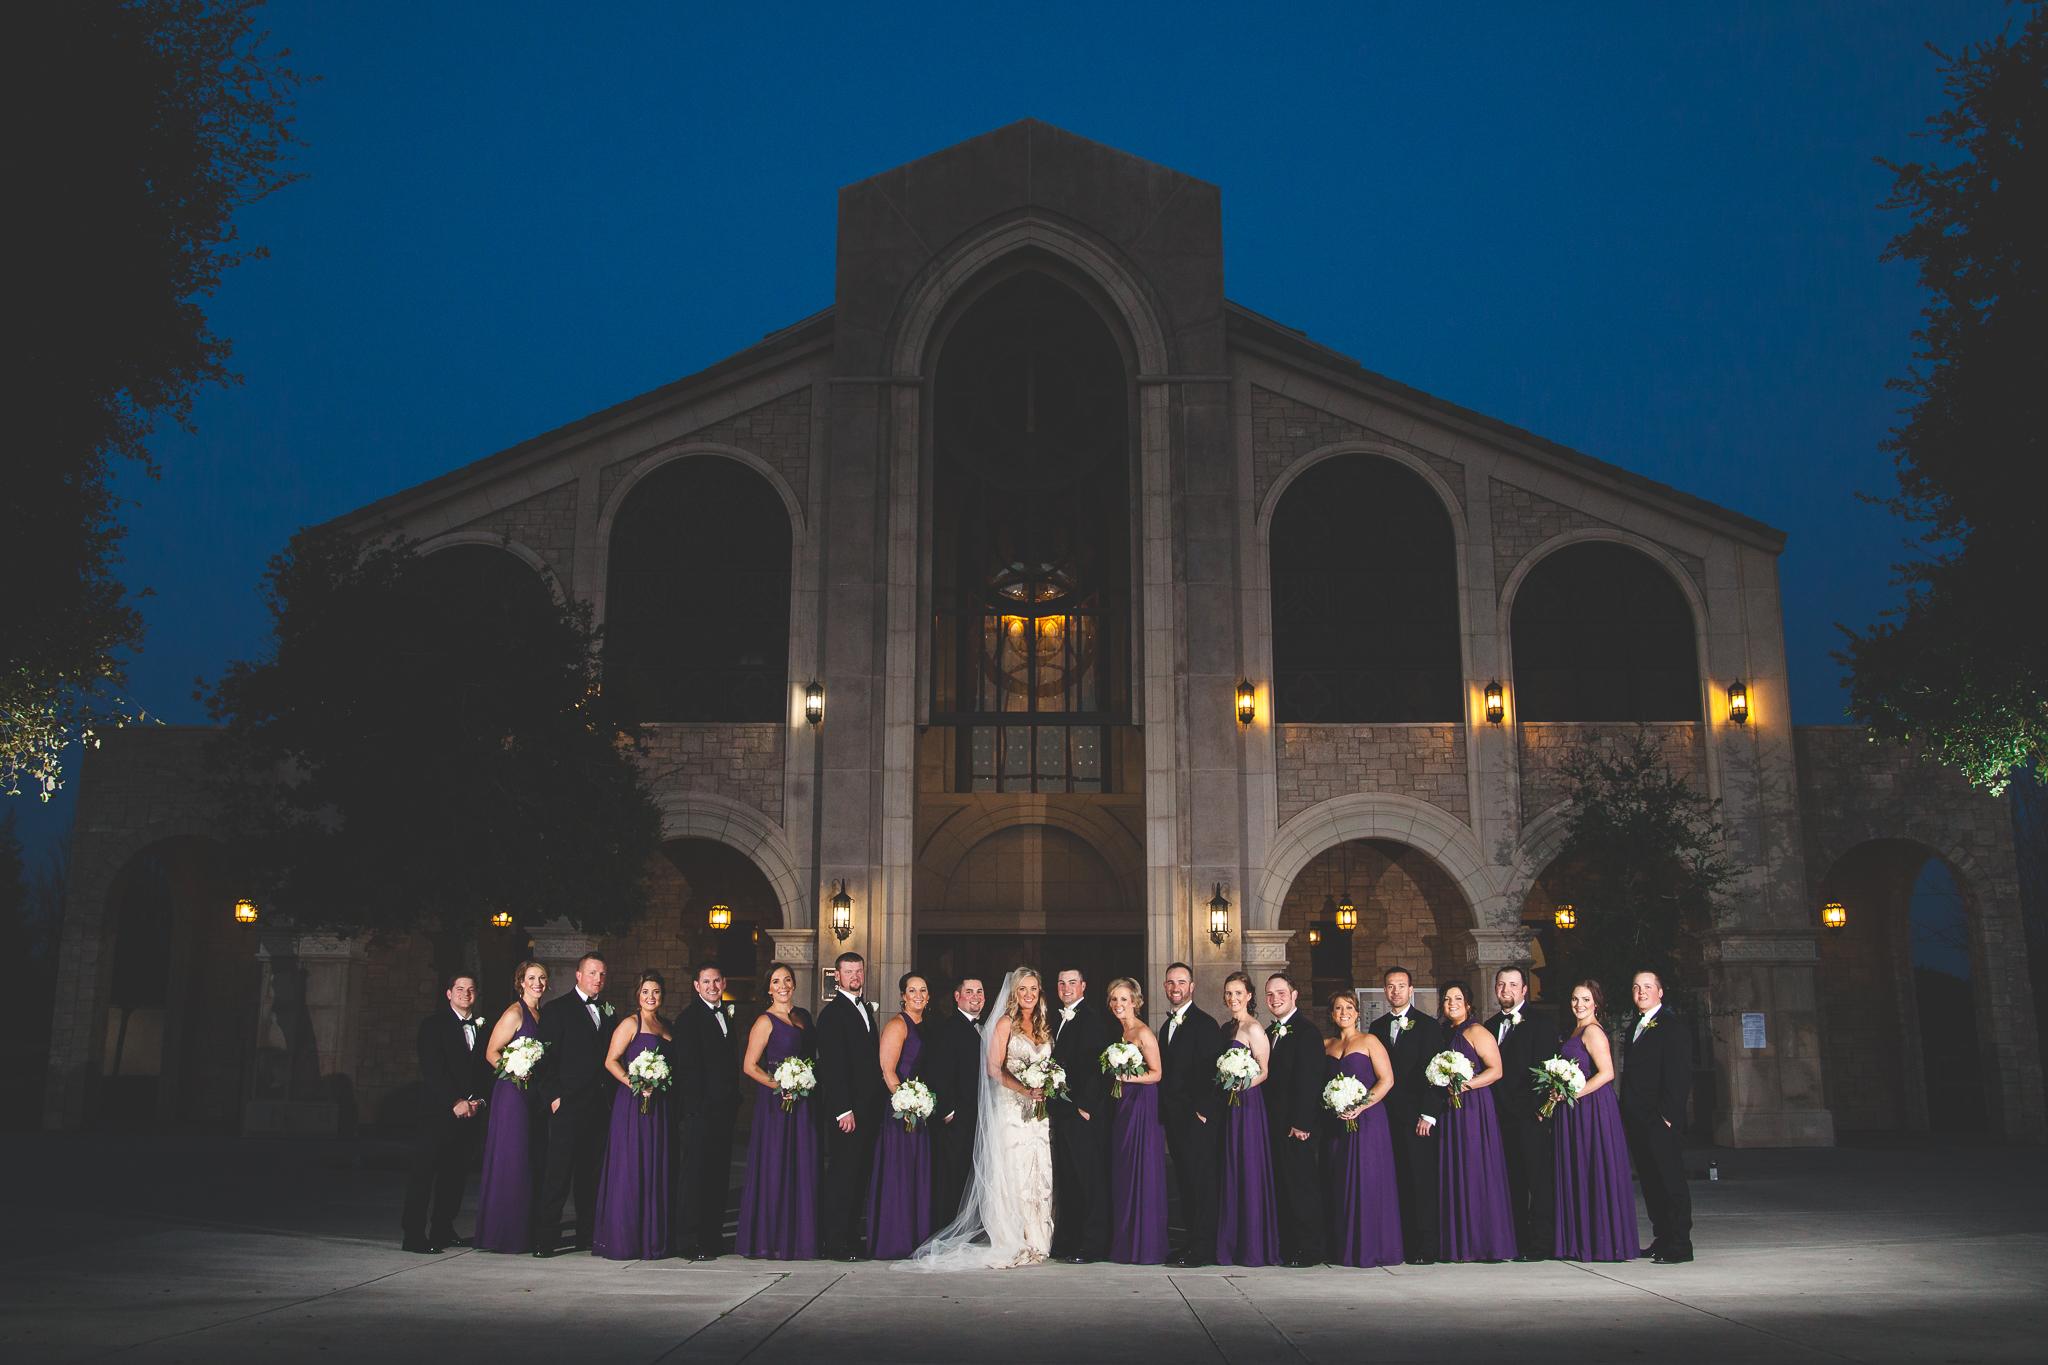 st. stanislaus catholic church modesto wedding